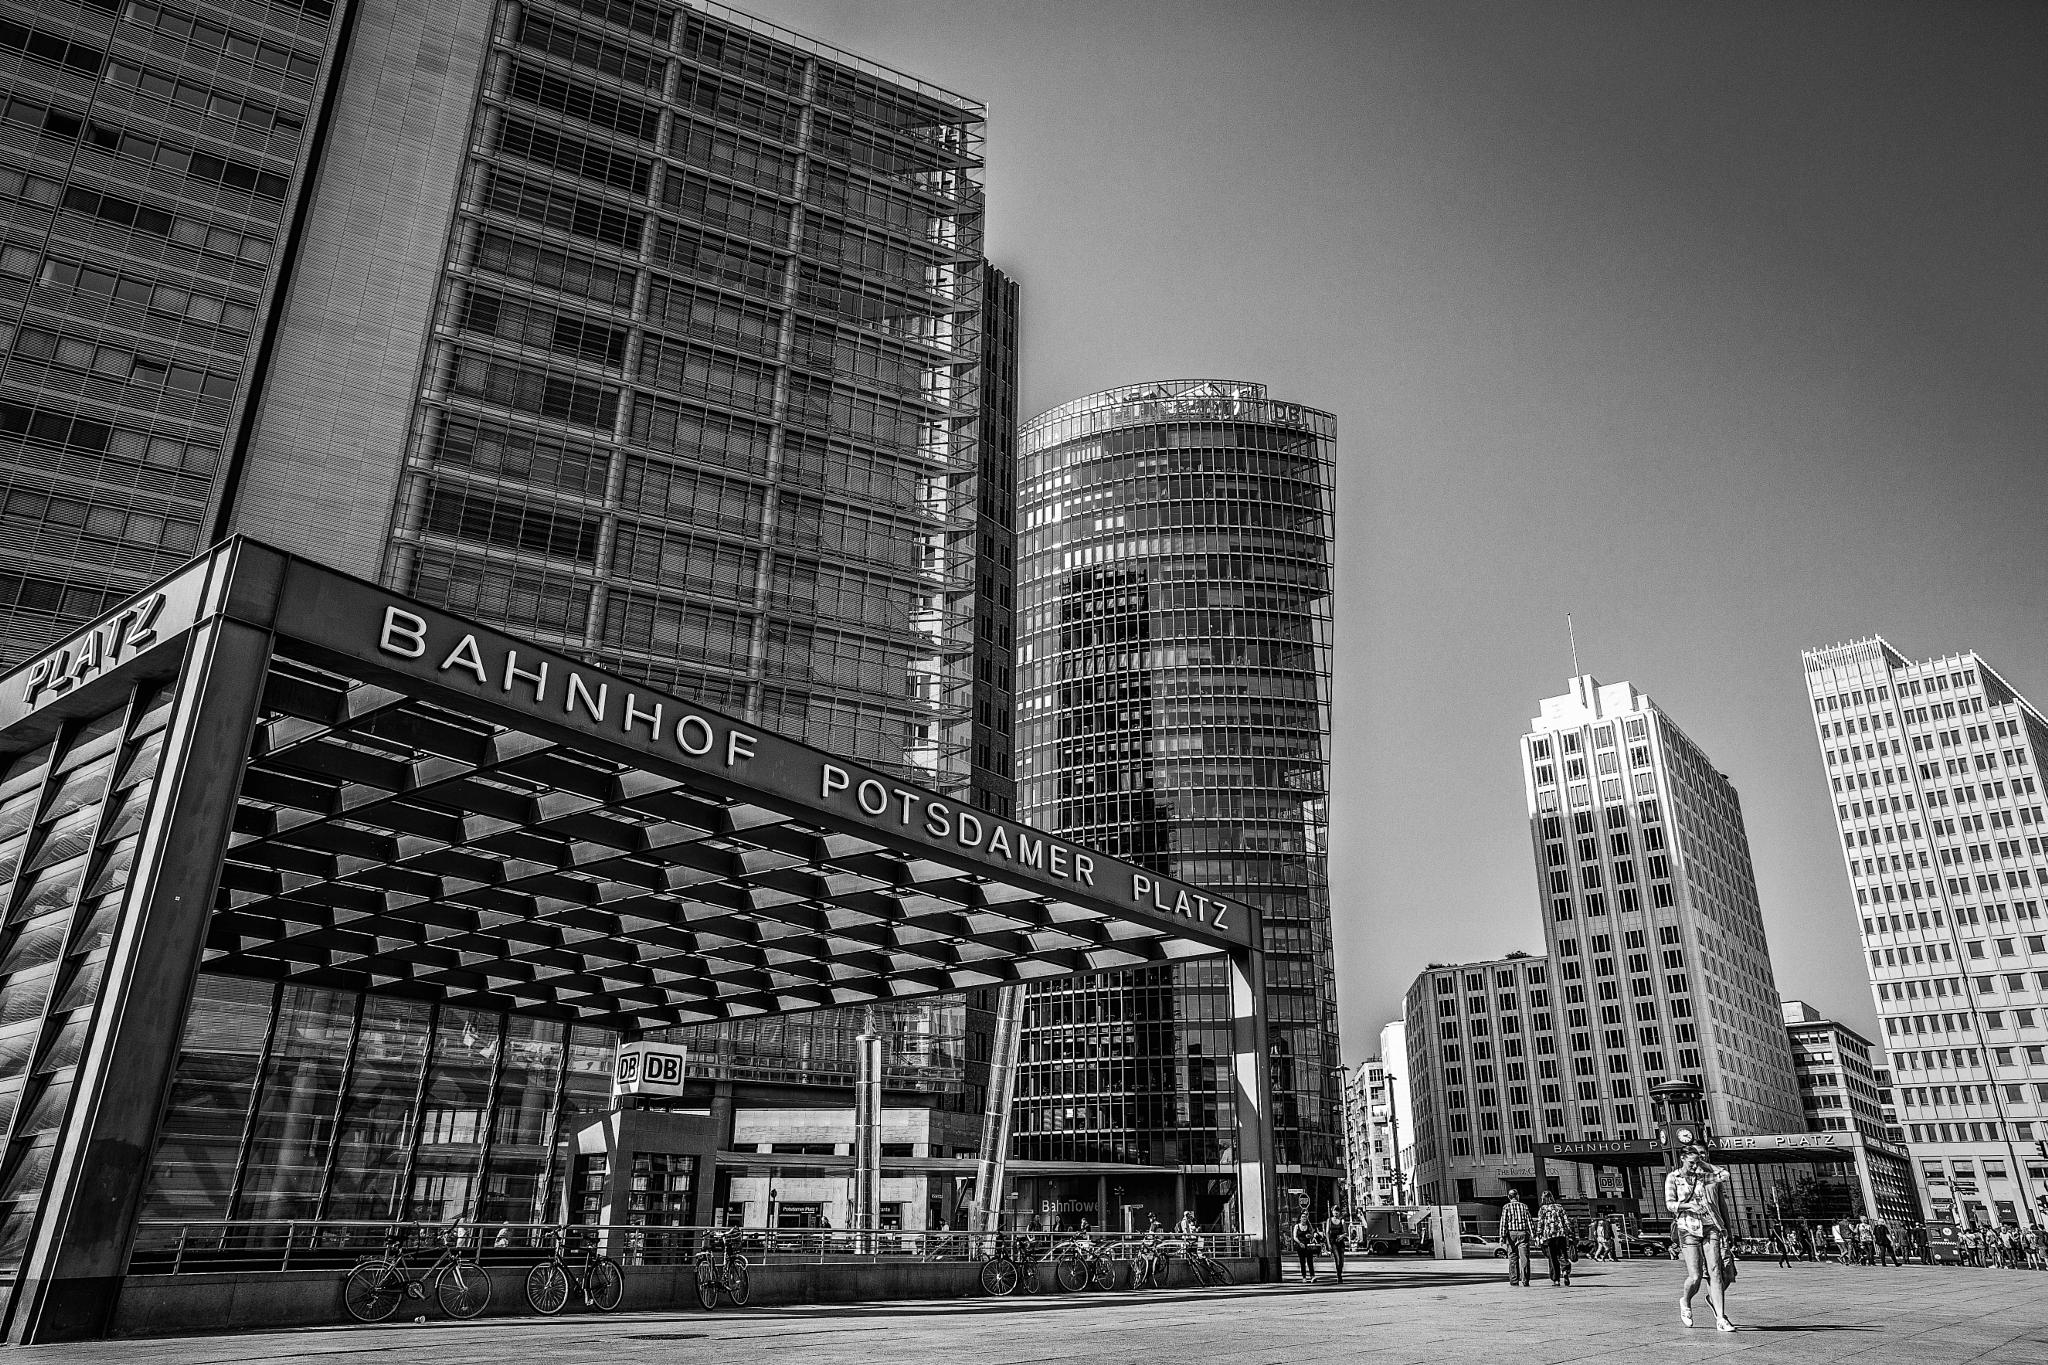 Potsdamer Platz by Kalin Kalpachev